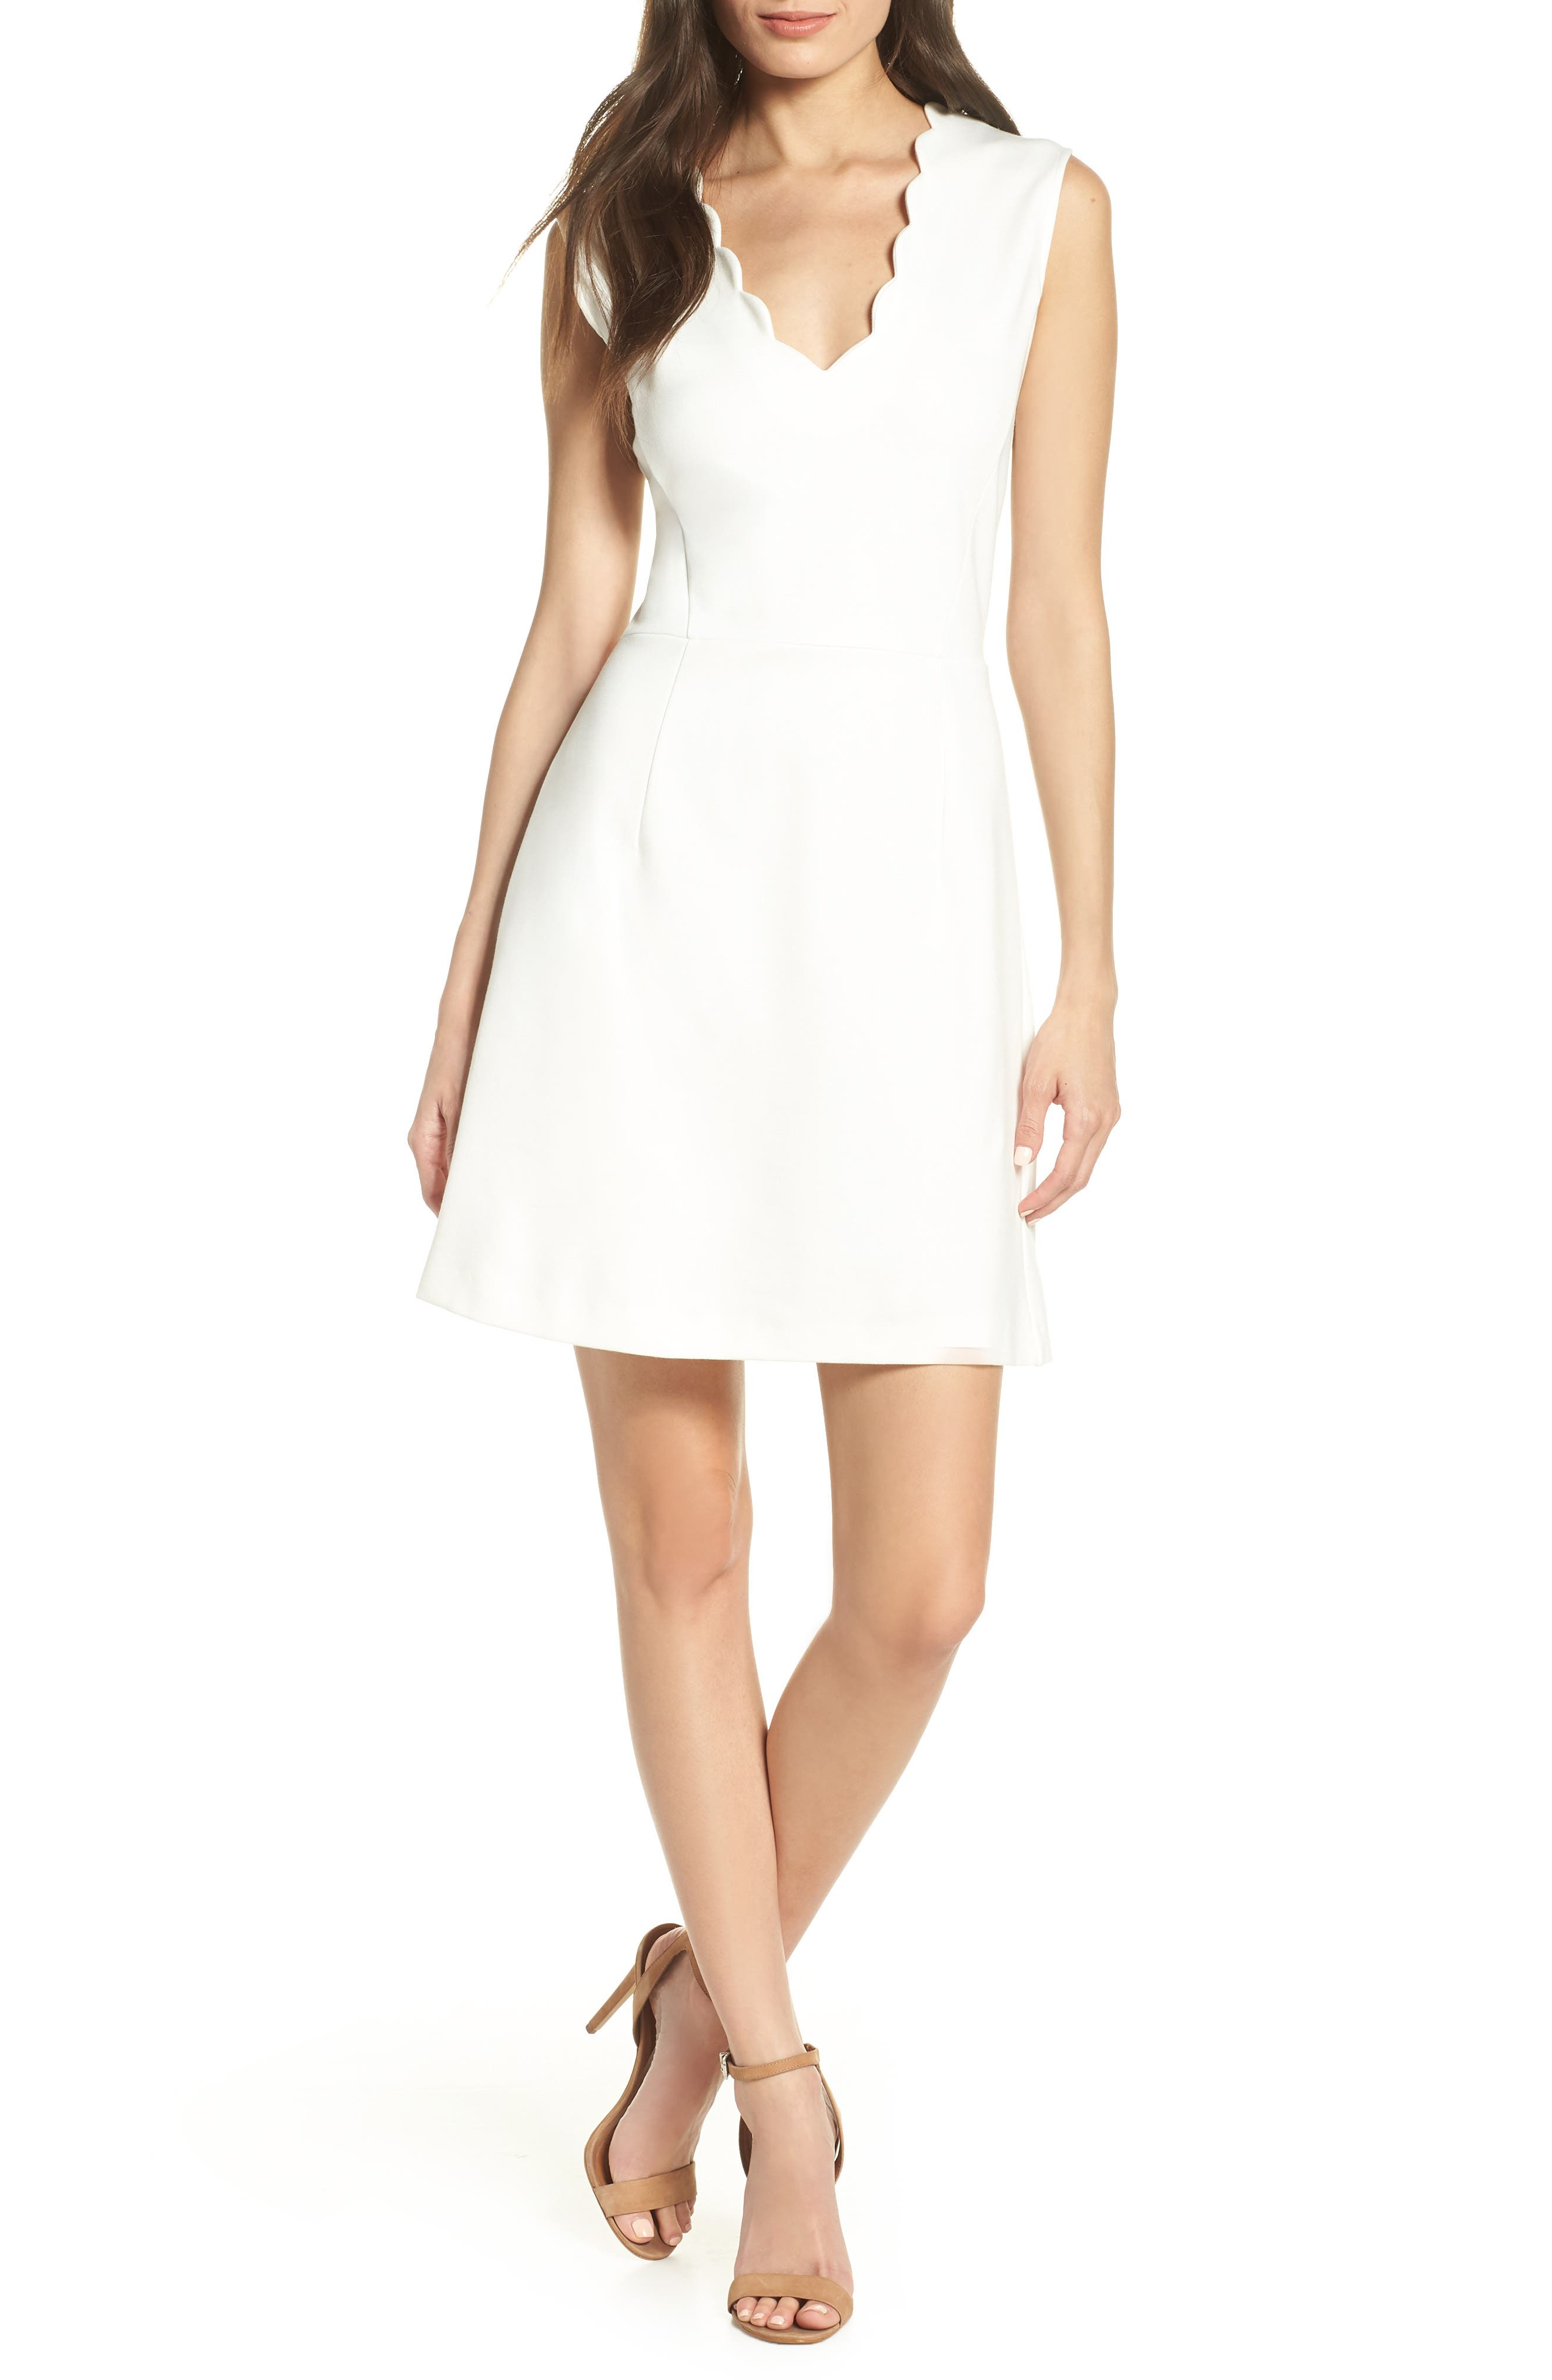 Lula Sundae Scalloped Sheath Dress, Main, color, SUMMER WHITE